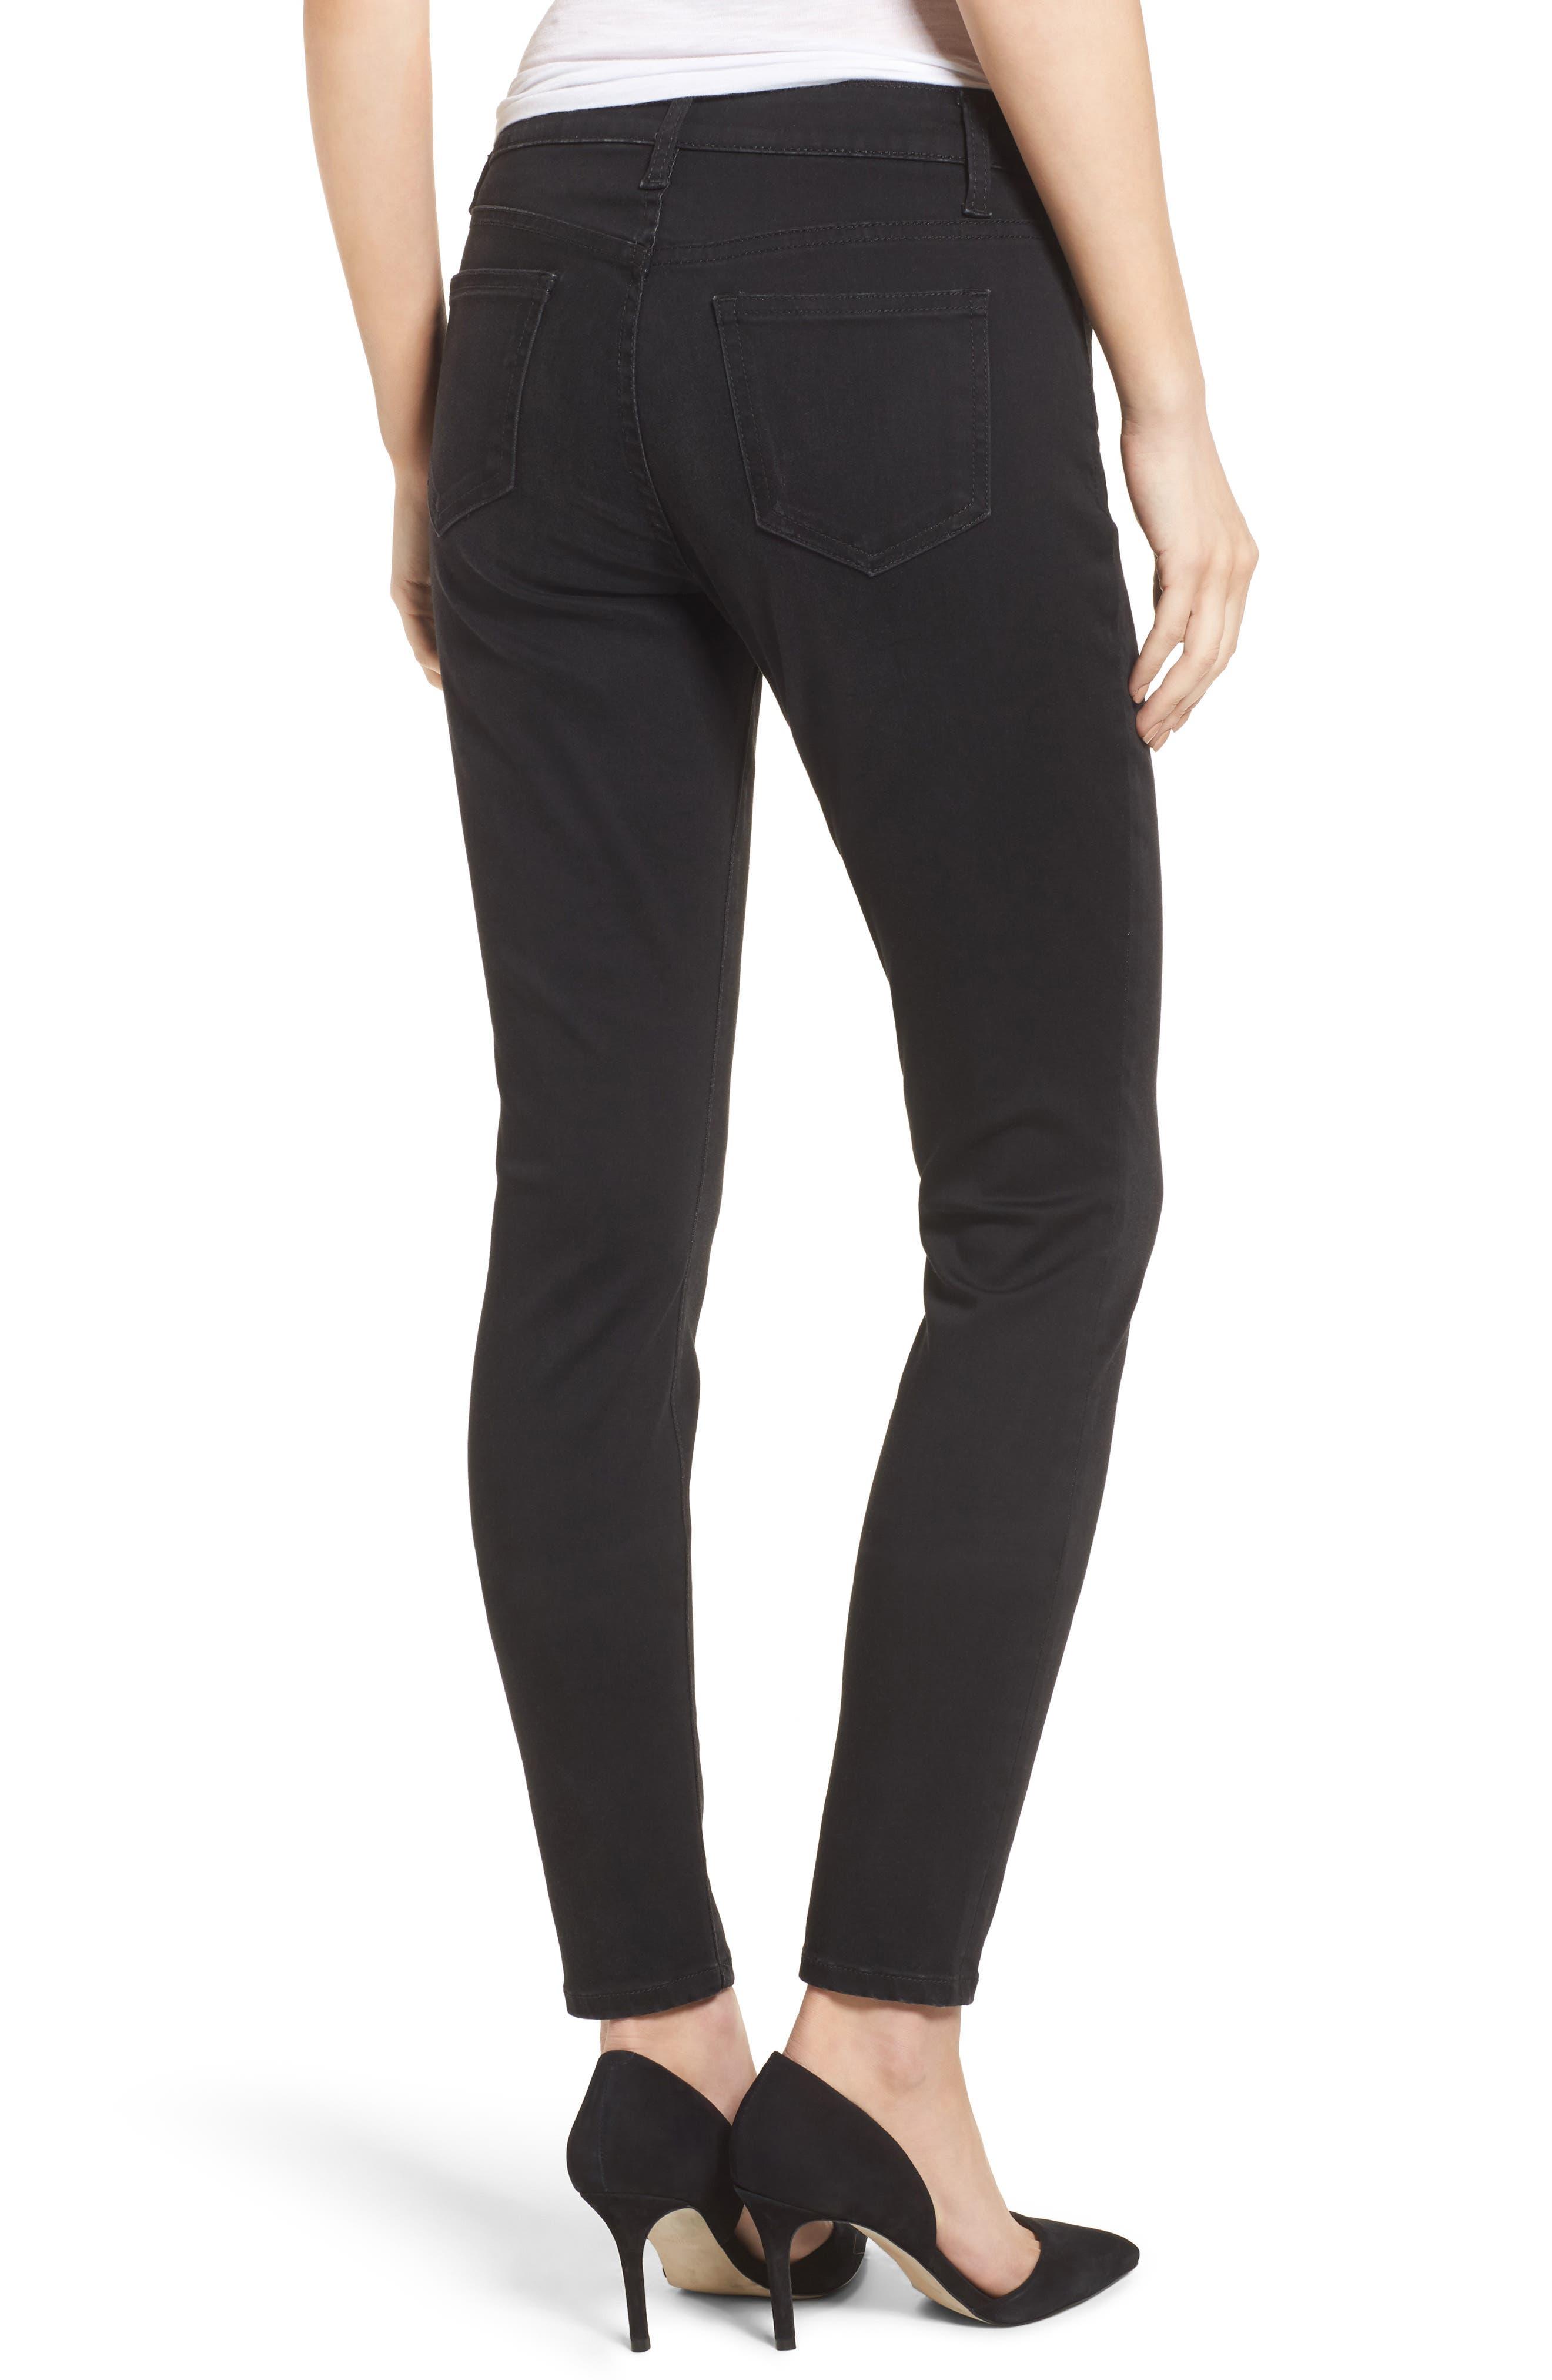 Alternate Image 2  - KUT from the Kloth Mia Curvy Fit Skinny Jeans (Regular & Petite)